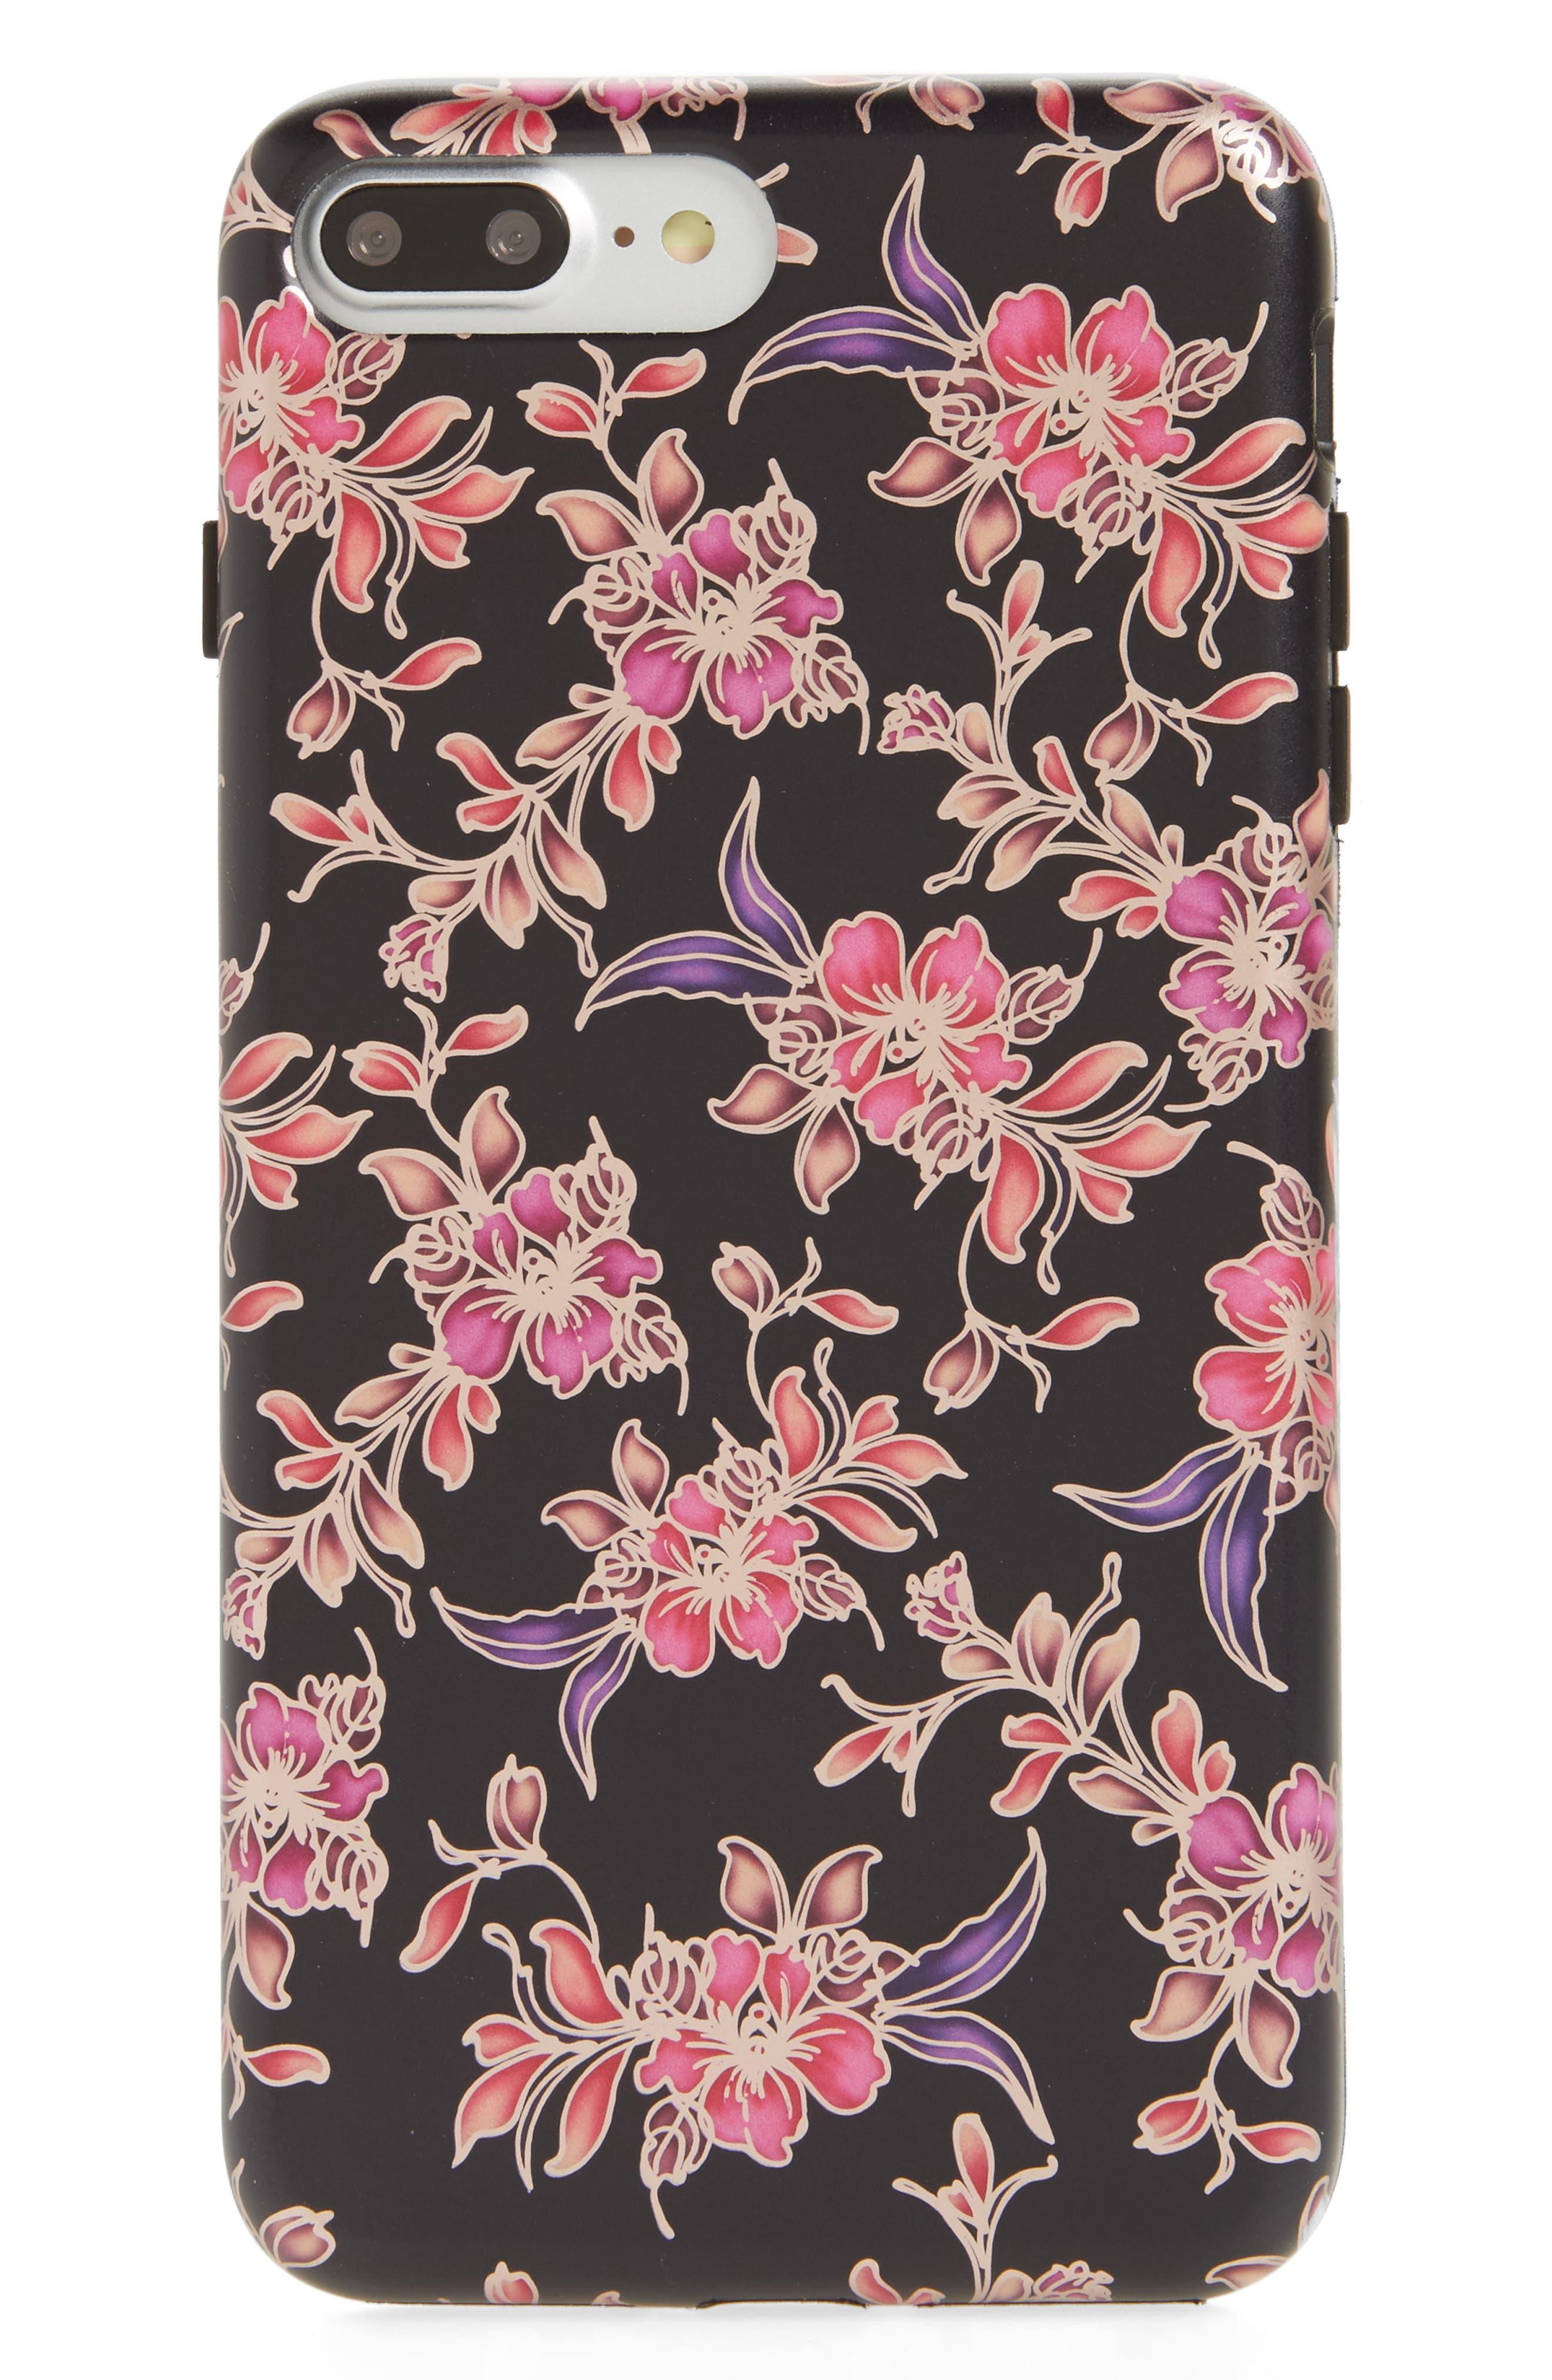 Midnight Floral Chrome iPhone 7/8 Plus Case,                             Main thumbnail 1, color,                             Black